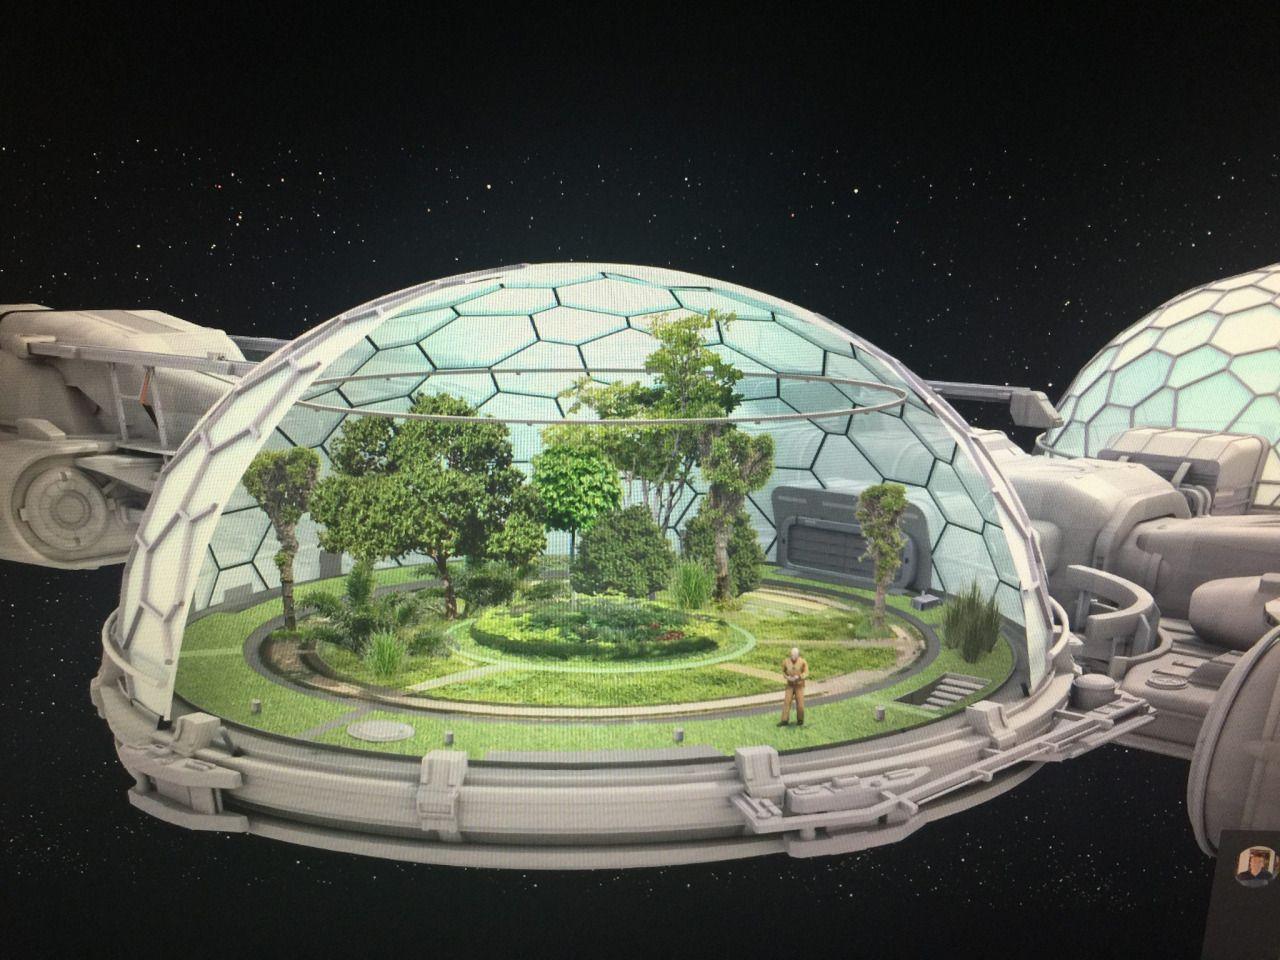 future moon base interior designs